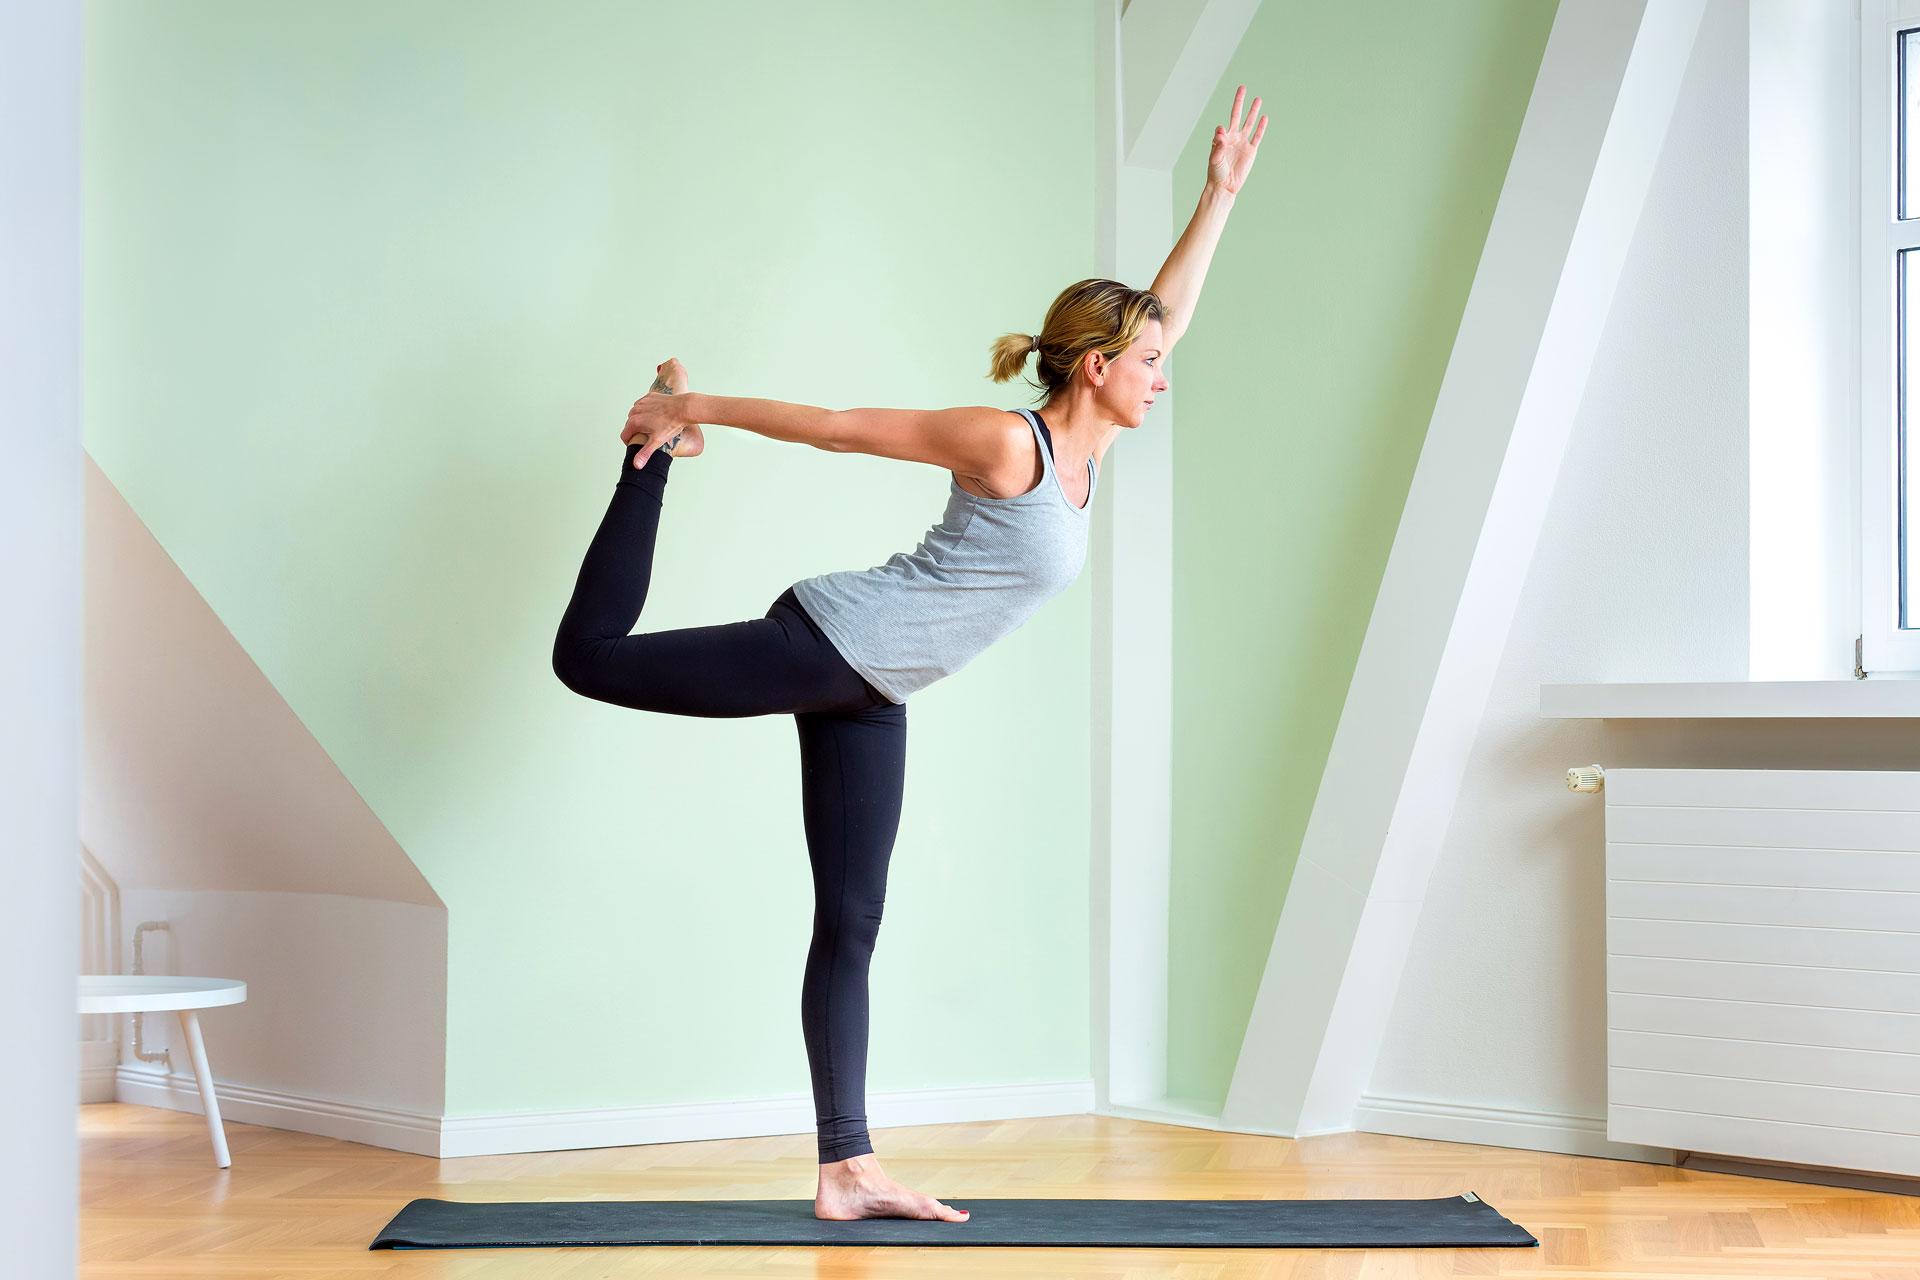 yogaposition-businessfotos-websitefotos-yoga